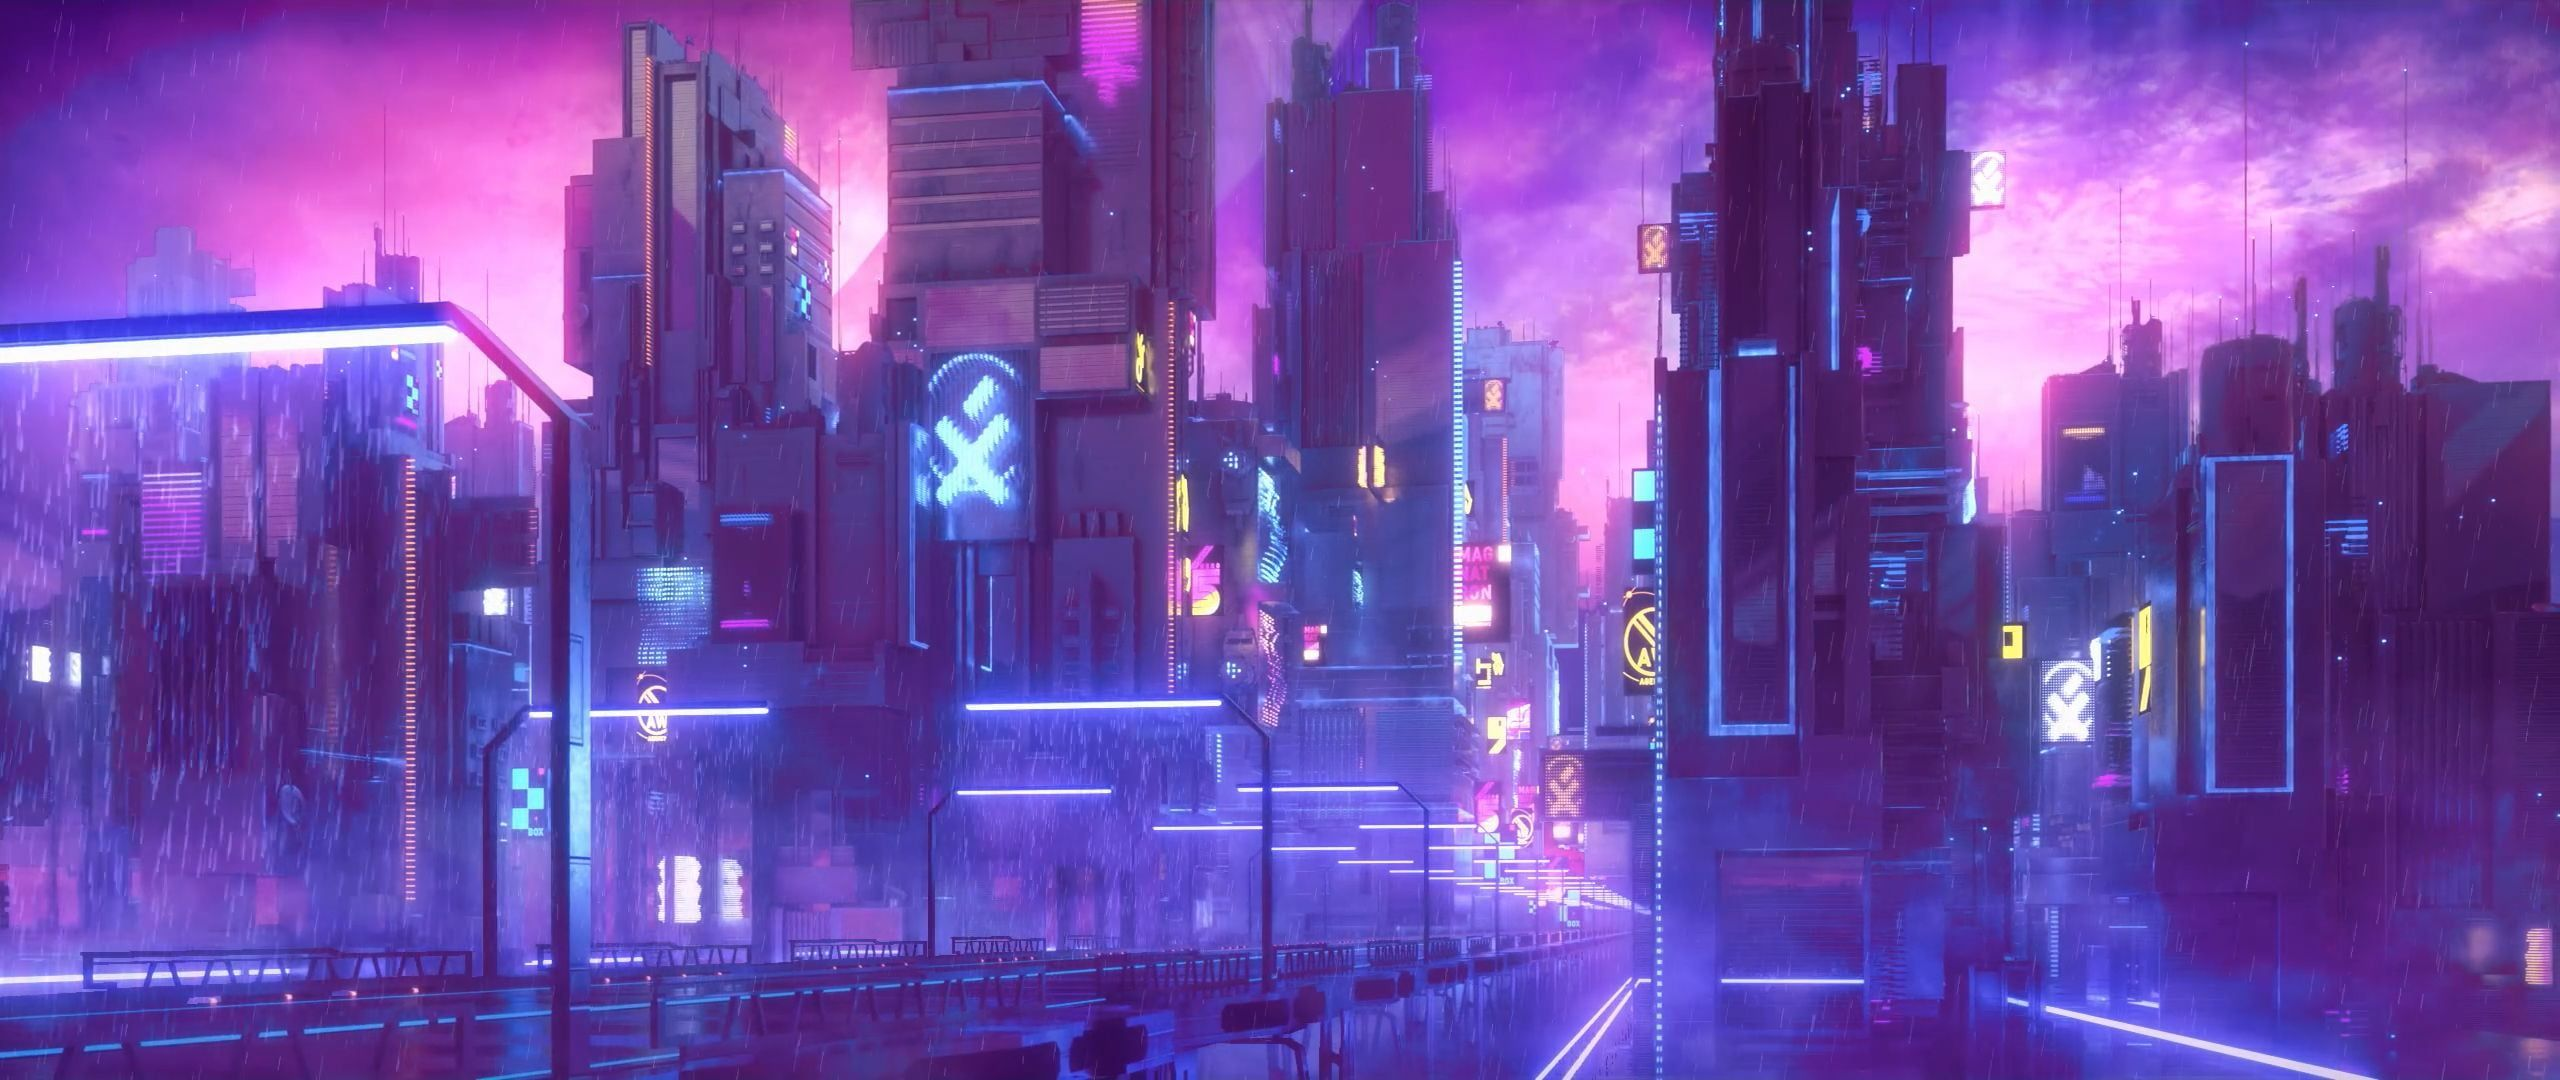 City Animated Digital Wallpaper Cyberpunk Neon 2k Wallpaper Hdwallpaper Desktop City Wallpaper Neon Wallpaper Aesthetic Desktop Wallpaper